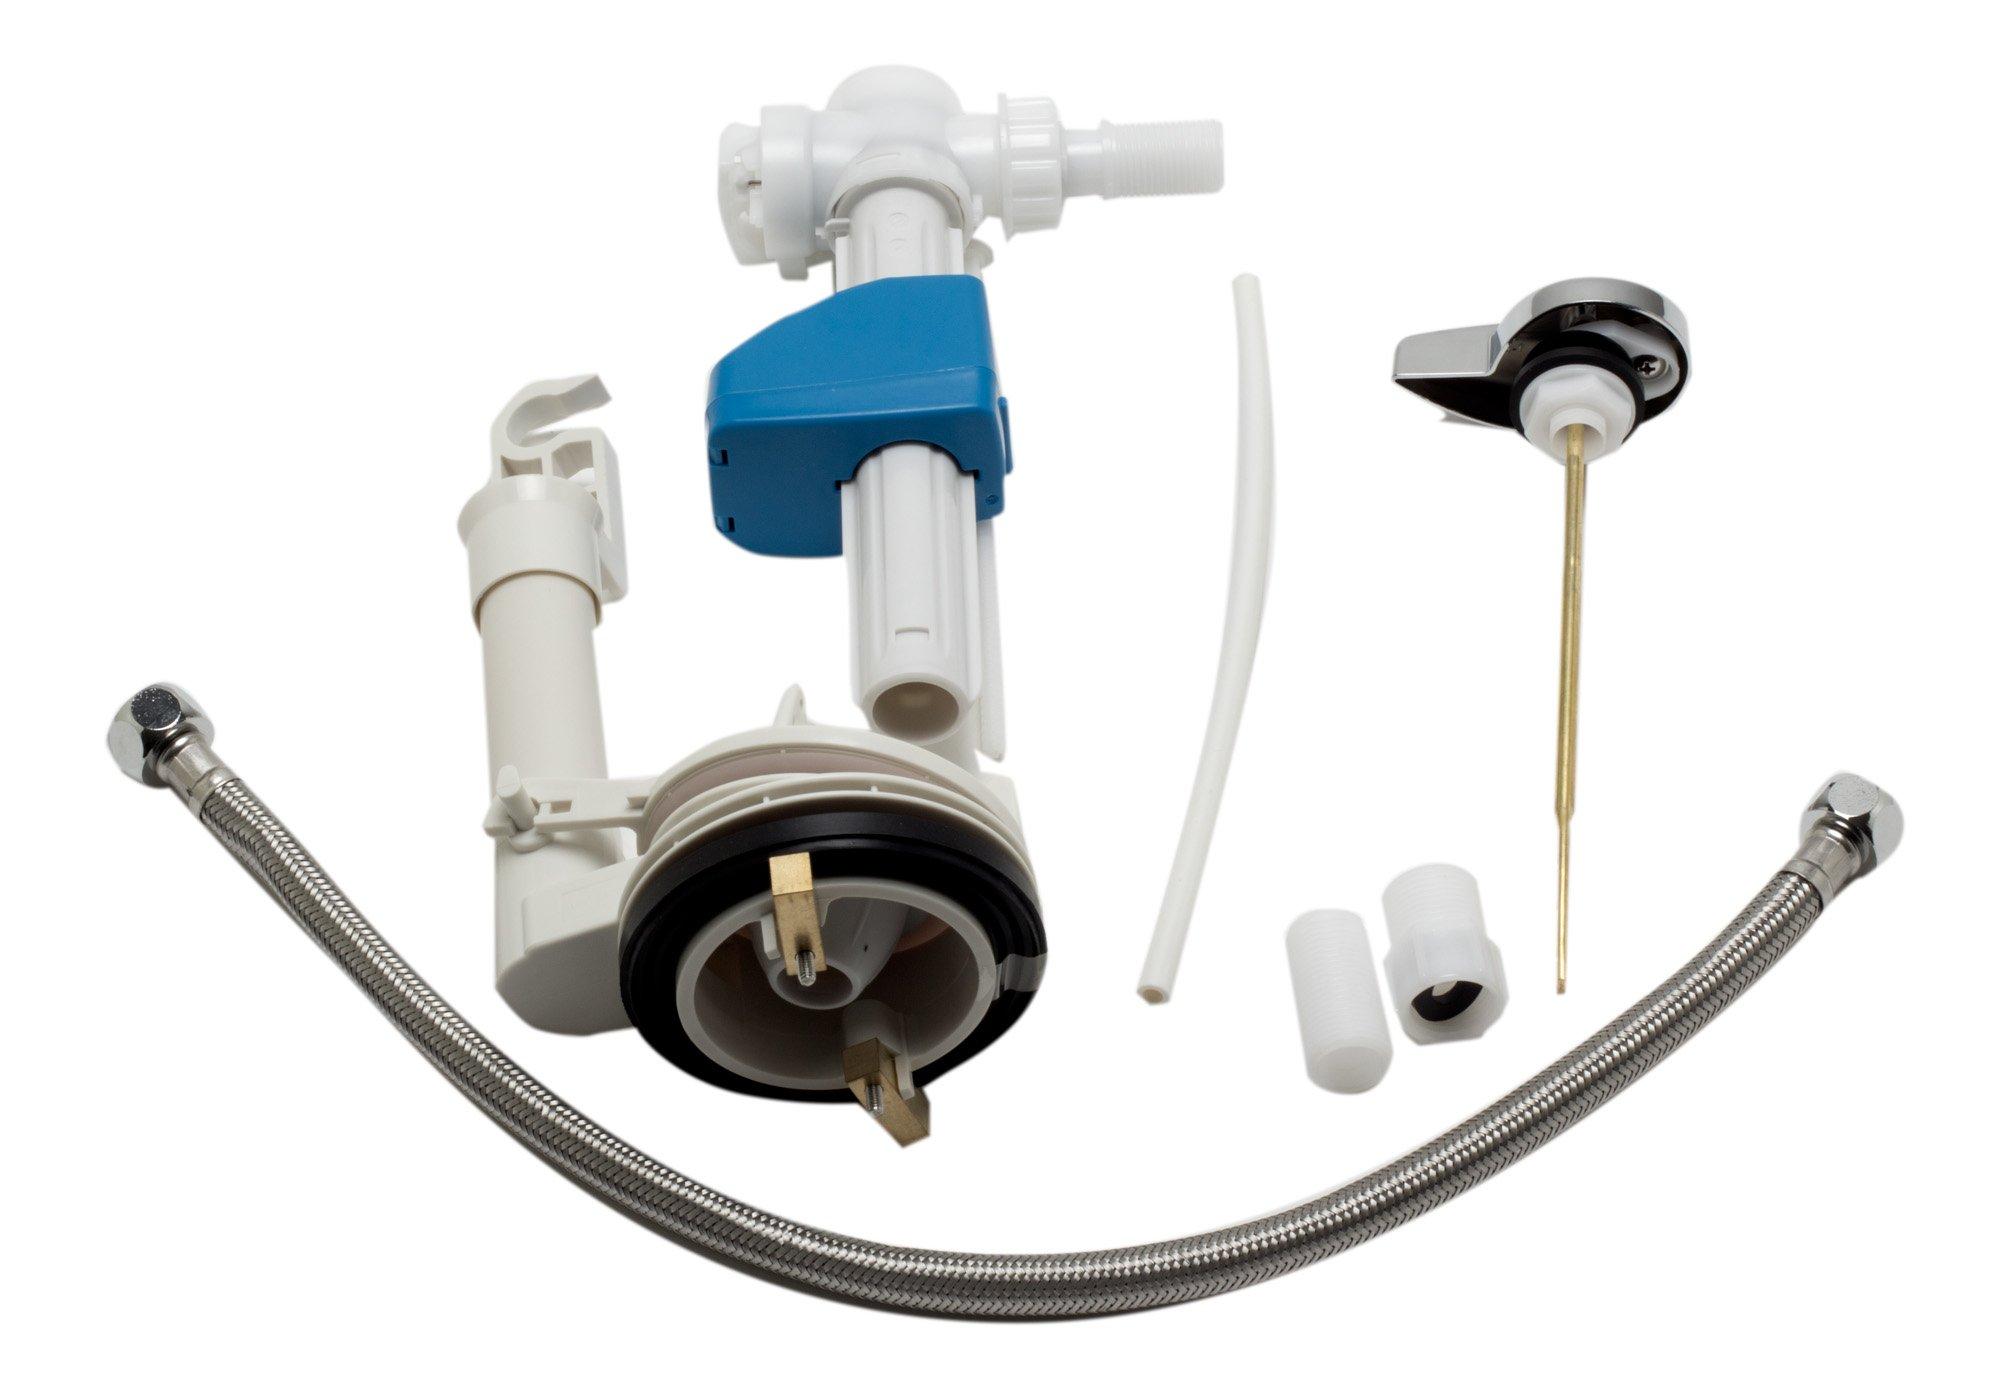 EAGO R-336FLUSH Replacement Toilet Flushing Mechanism for TB336 by EAGO